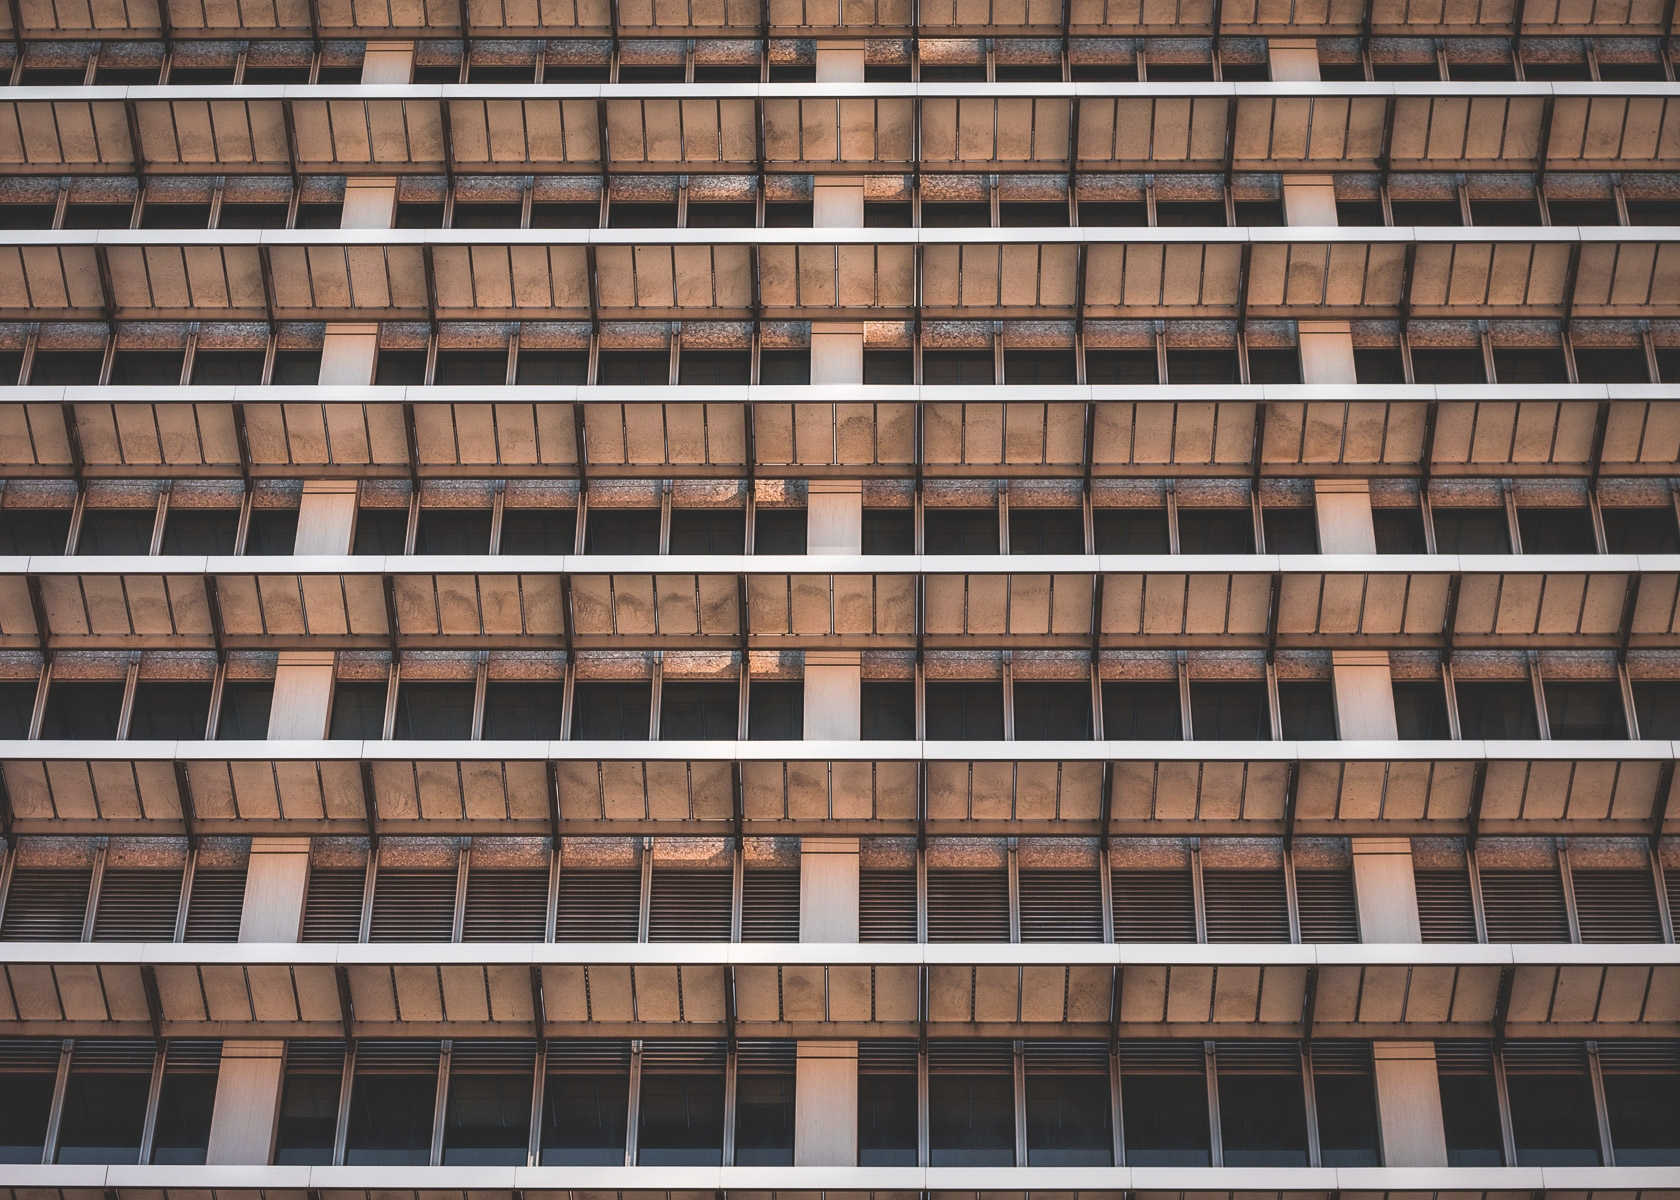 Ledges Abstract architectural d - mattgharvey   ello